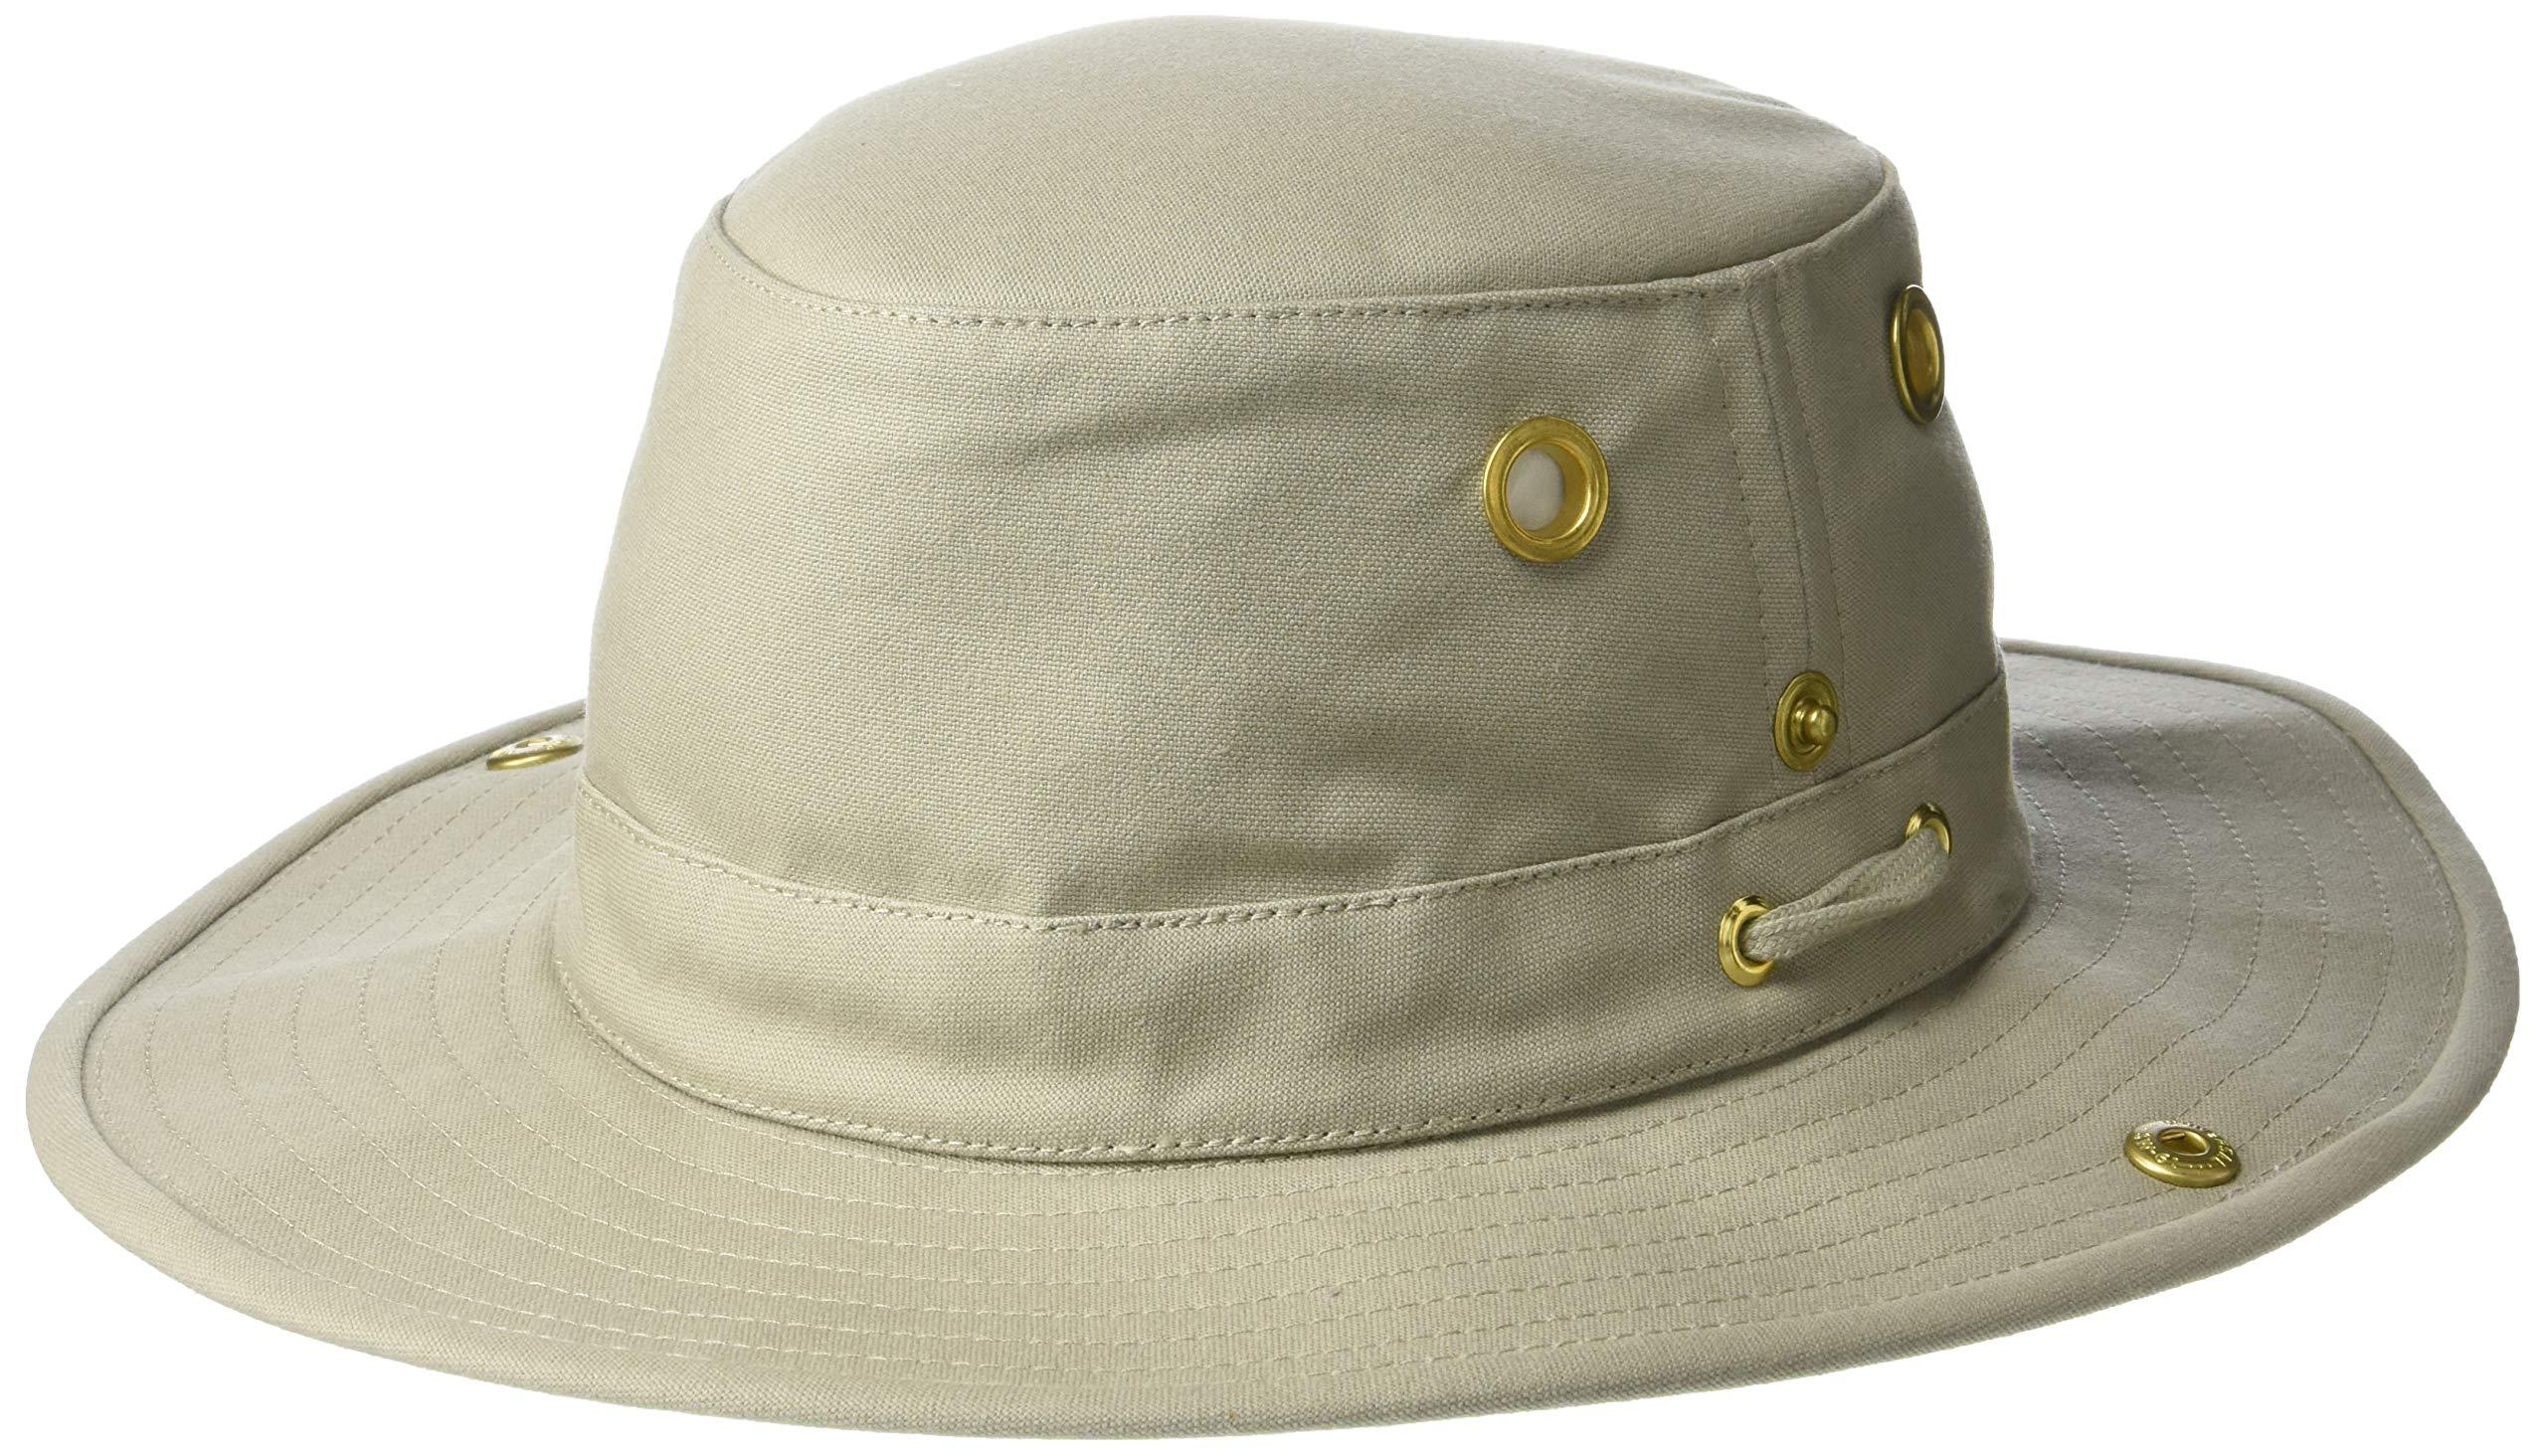 Tilley Endurables T3 Traditional Canvas Hat,Khaki,7 1/2